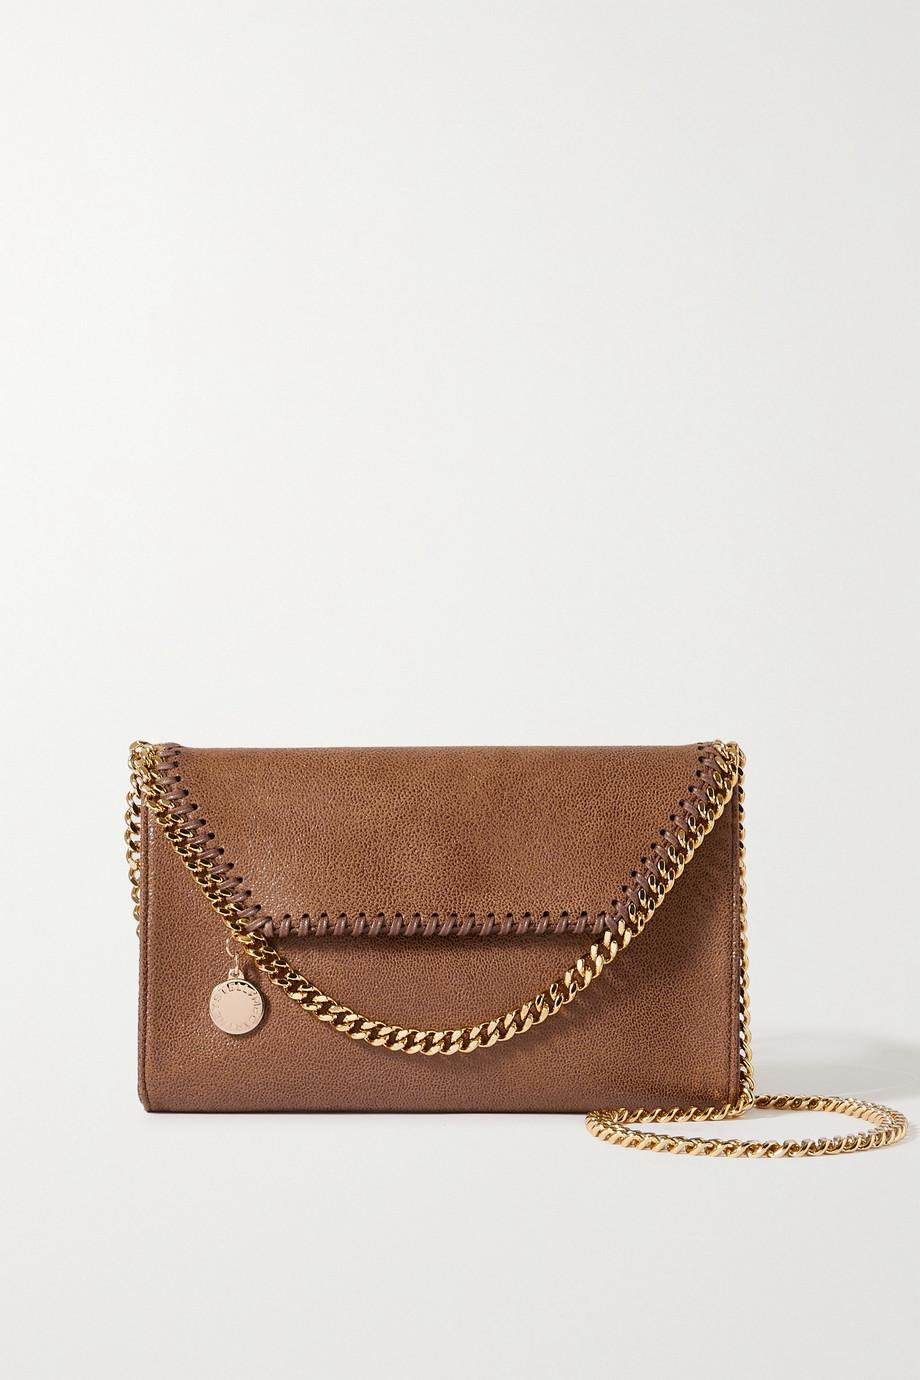 Stella McCartney The Falabella mini vegetarian brushed-leather shoulder bag